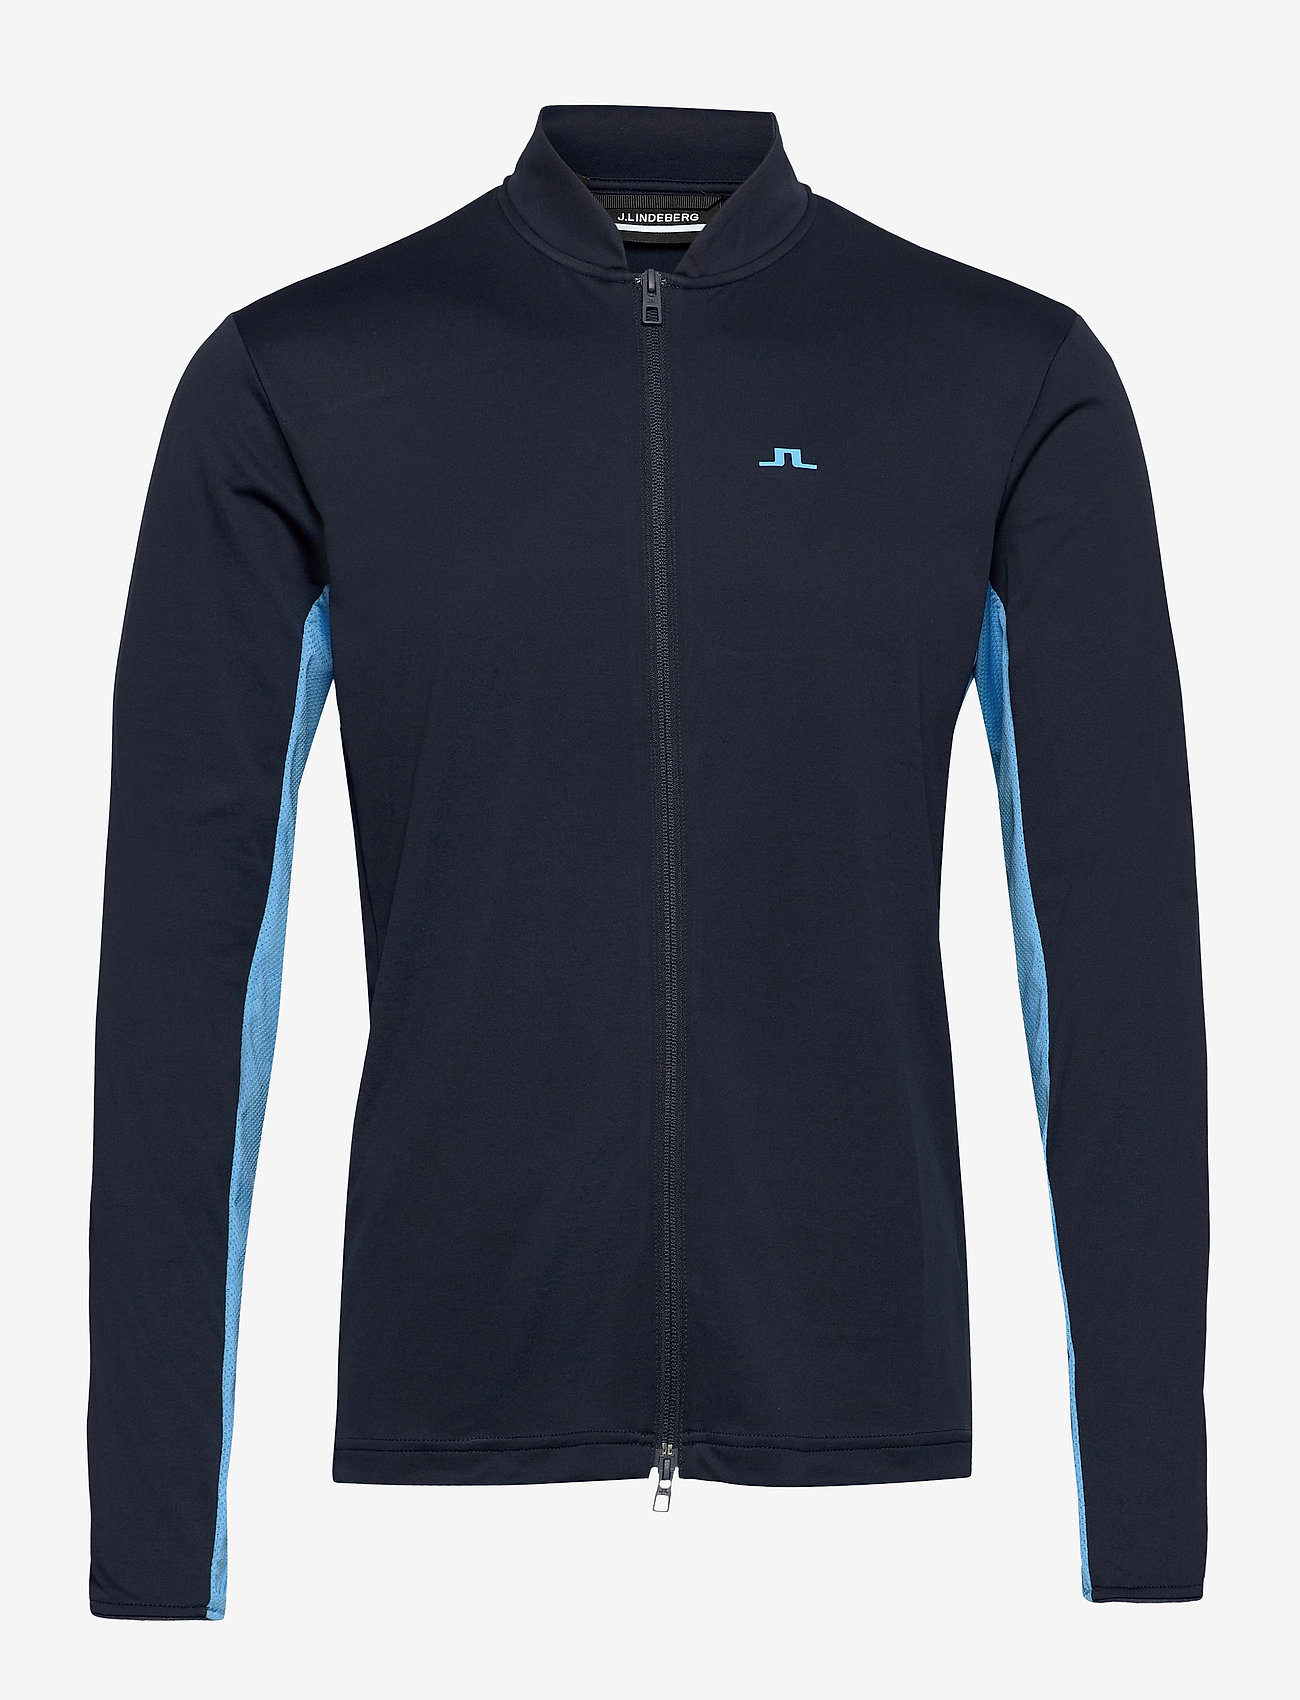 J. Lindeberg Golf - Alex Golf Mid Layer - fleece - jl navy - 1